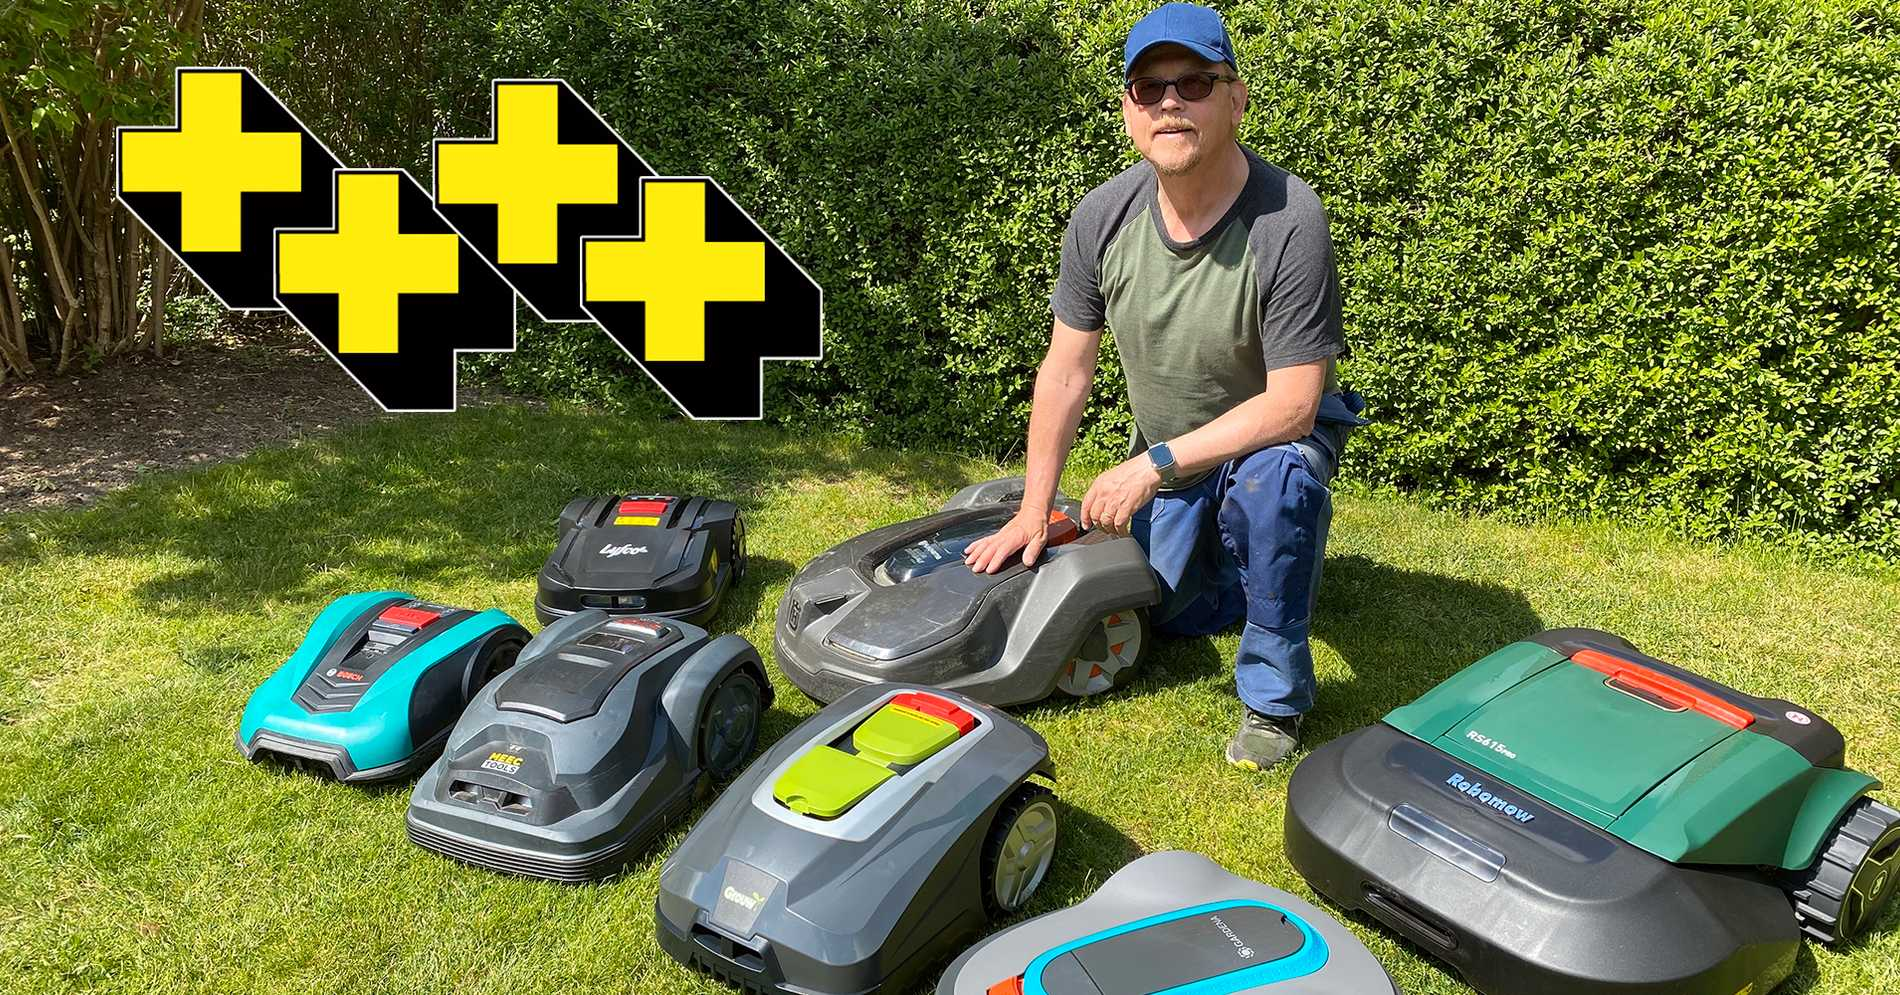 robotgräsklippare test | Robotnyheter